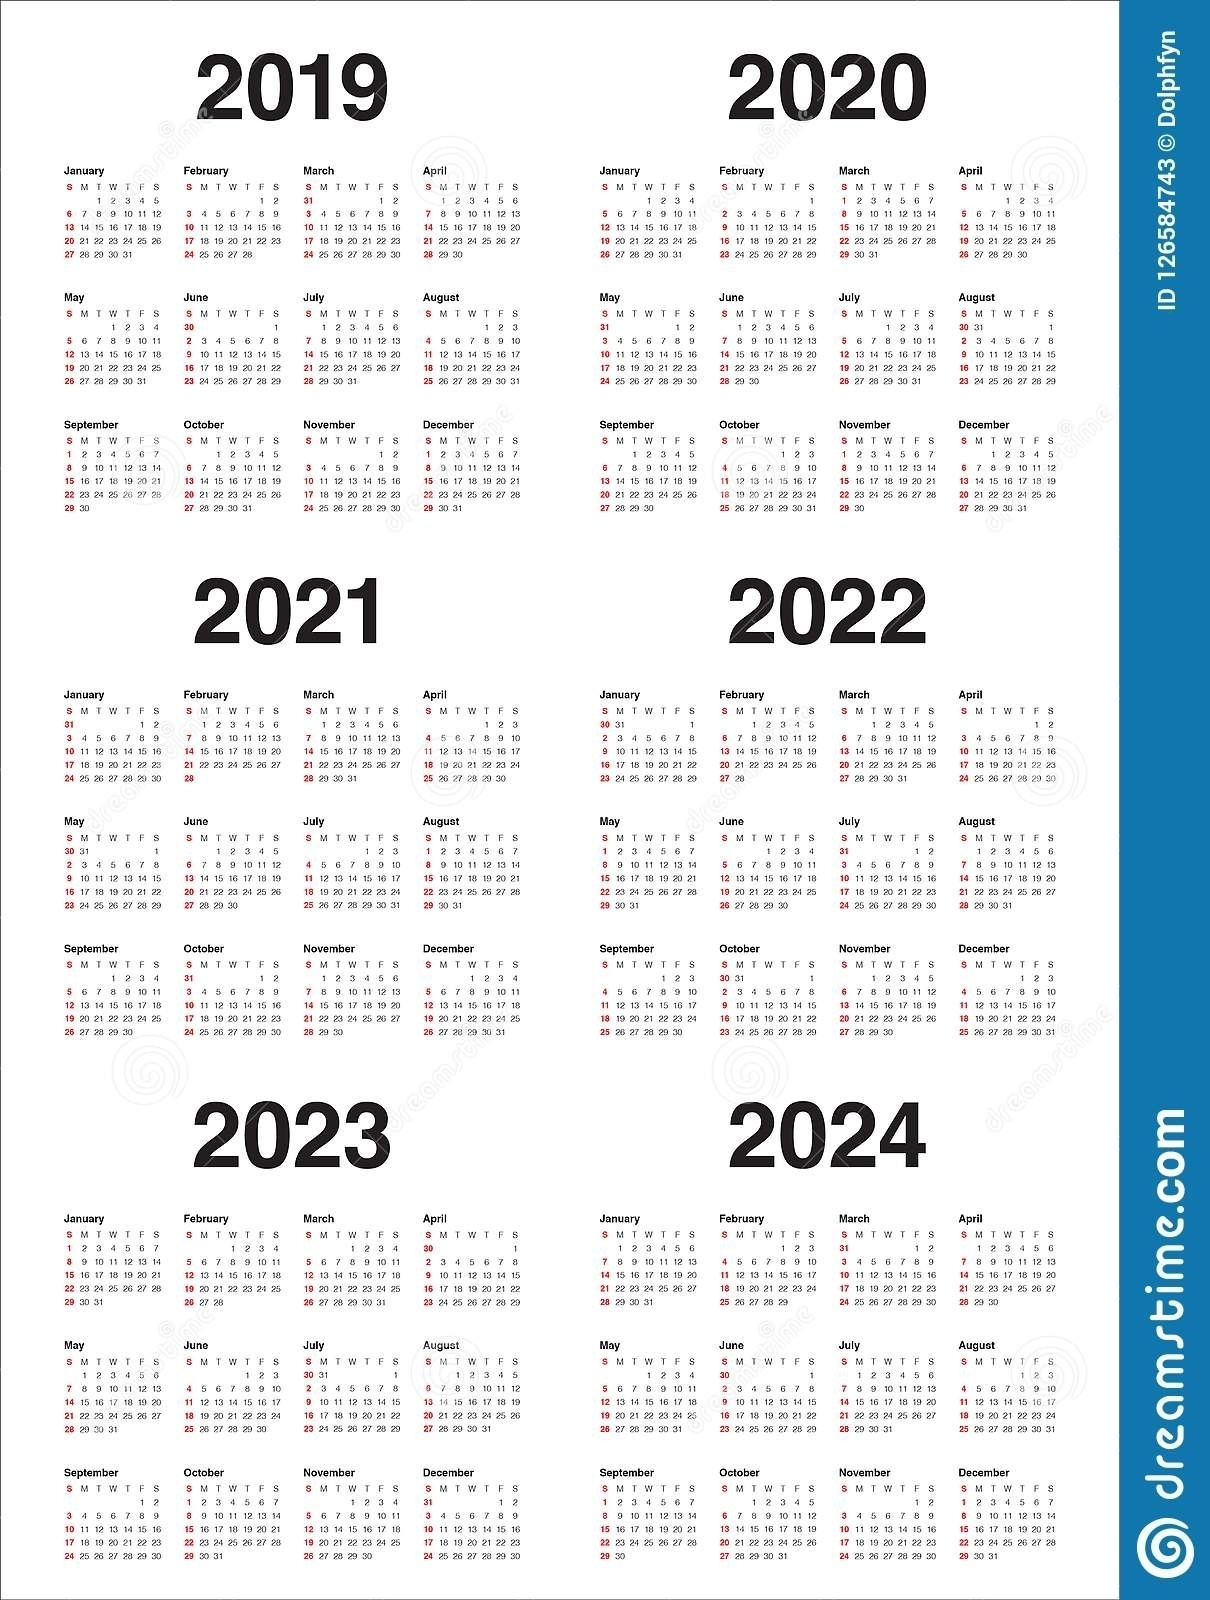 3 Year Calendar 2022 To 2024 | Month Calendar Printable